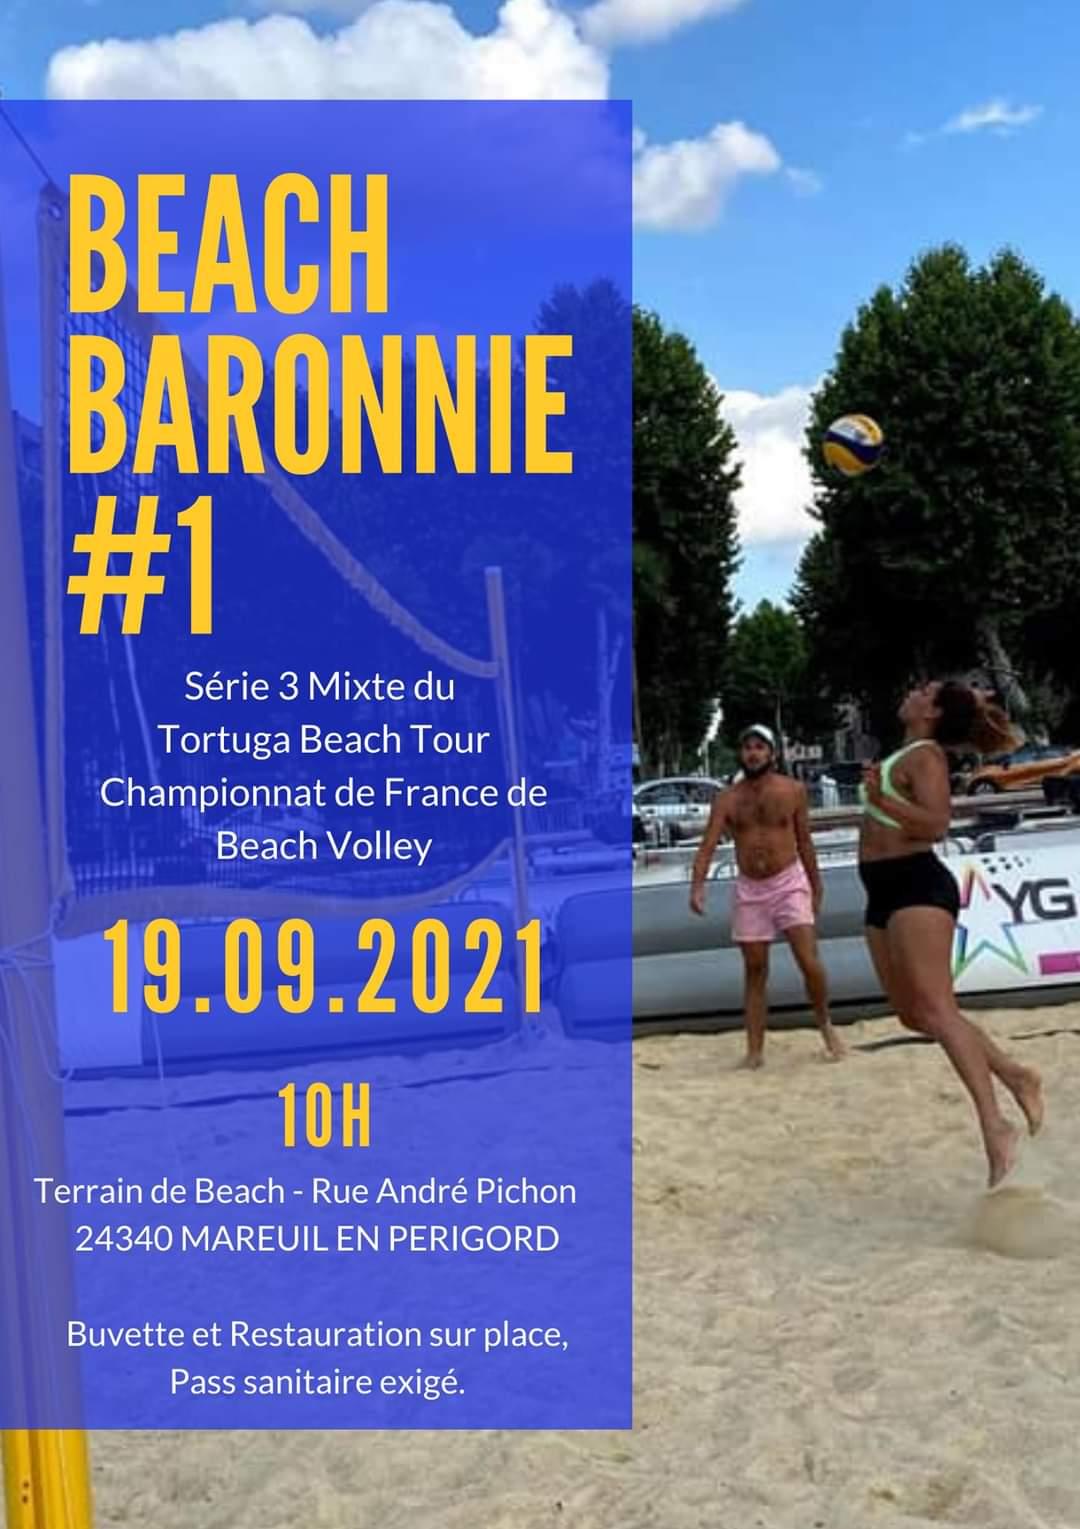 Championnat de Beach Volley